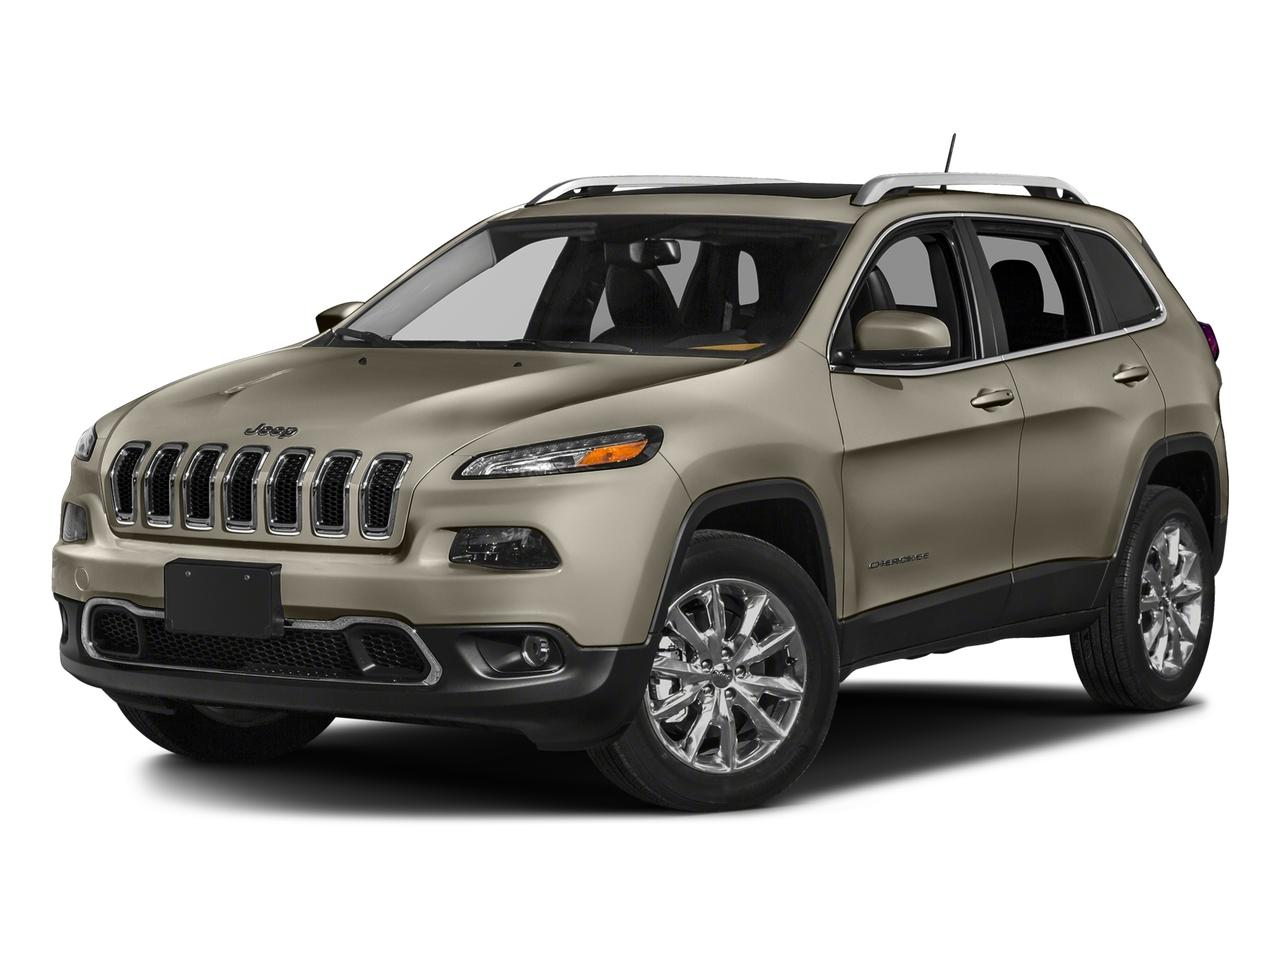 2018 Jeep Cherokee Vehicle Photo in Rockford, IL 61107